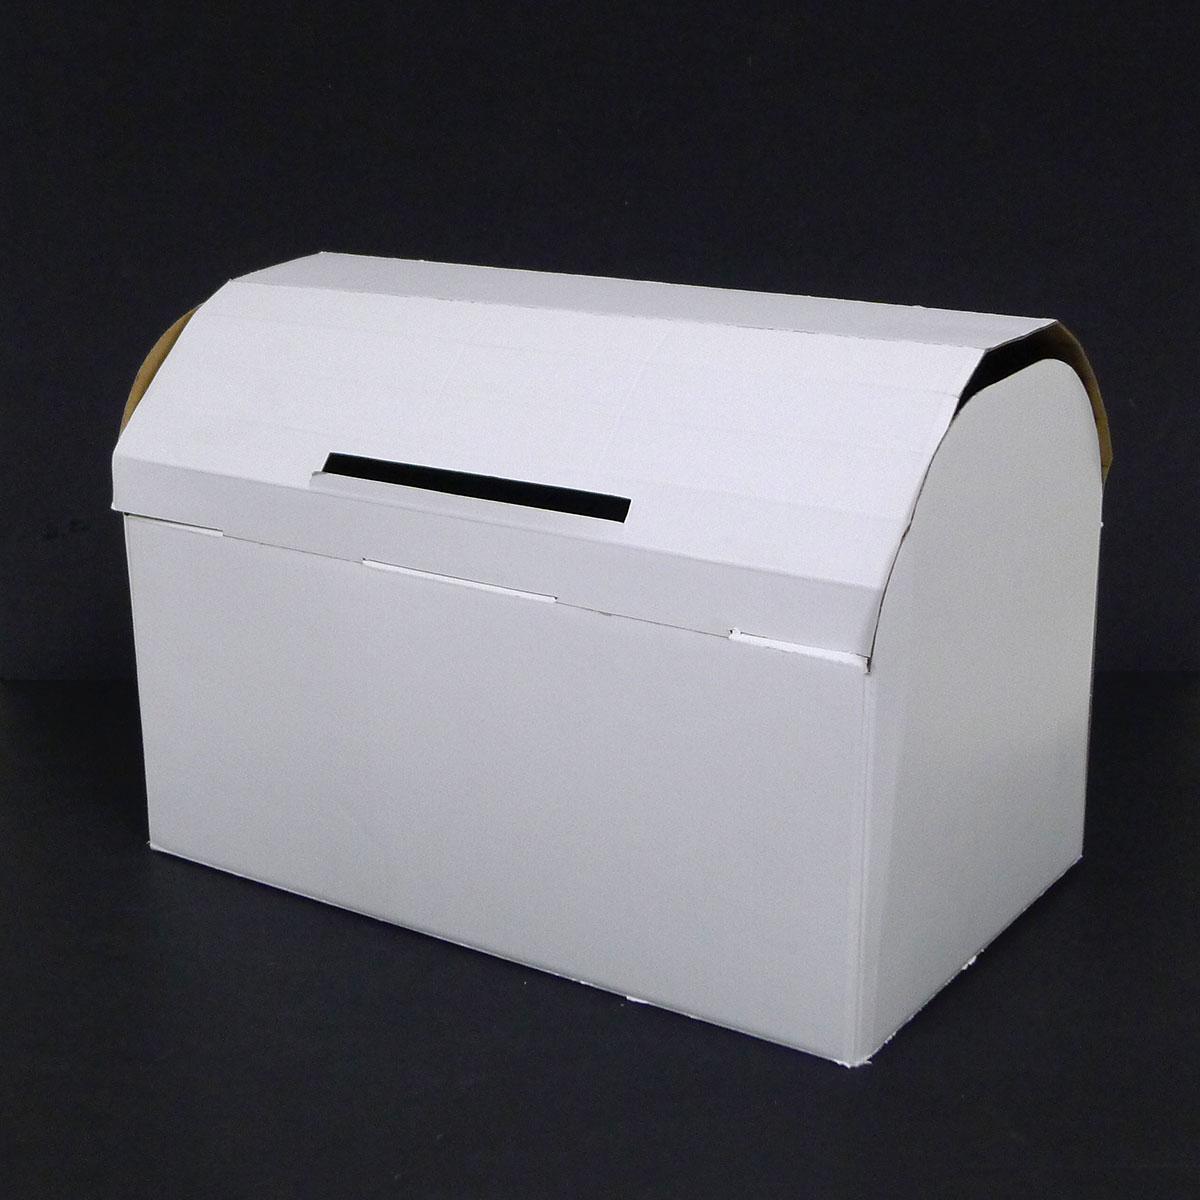 cardboard wishing well gift card treasure box money box. Black Bedroom Furniture Sets. Home Design Ideas